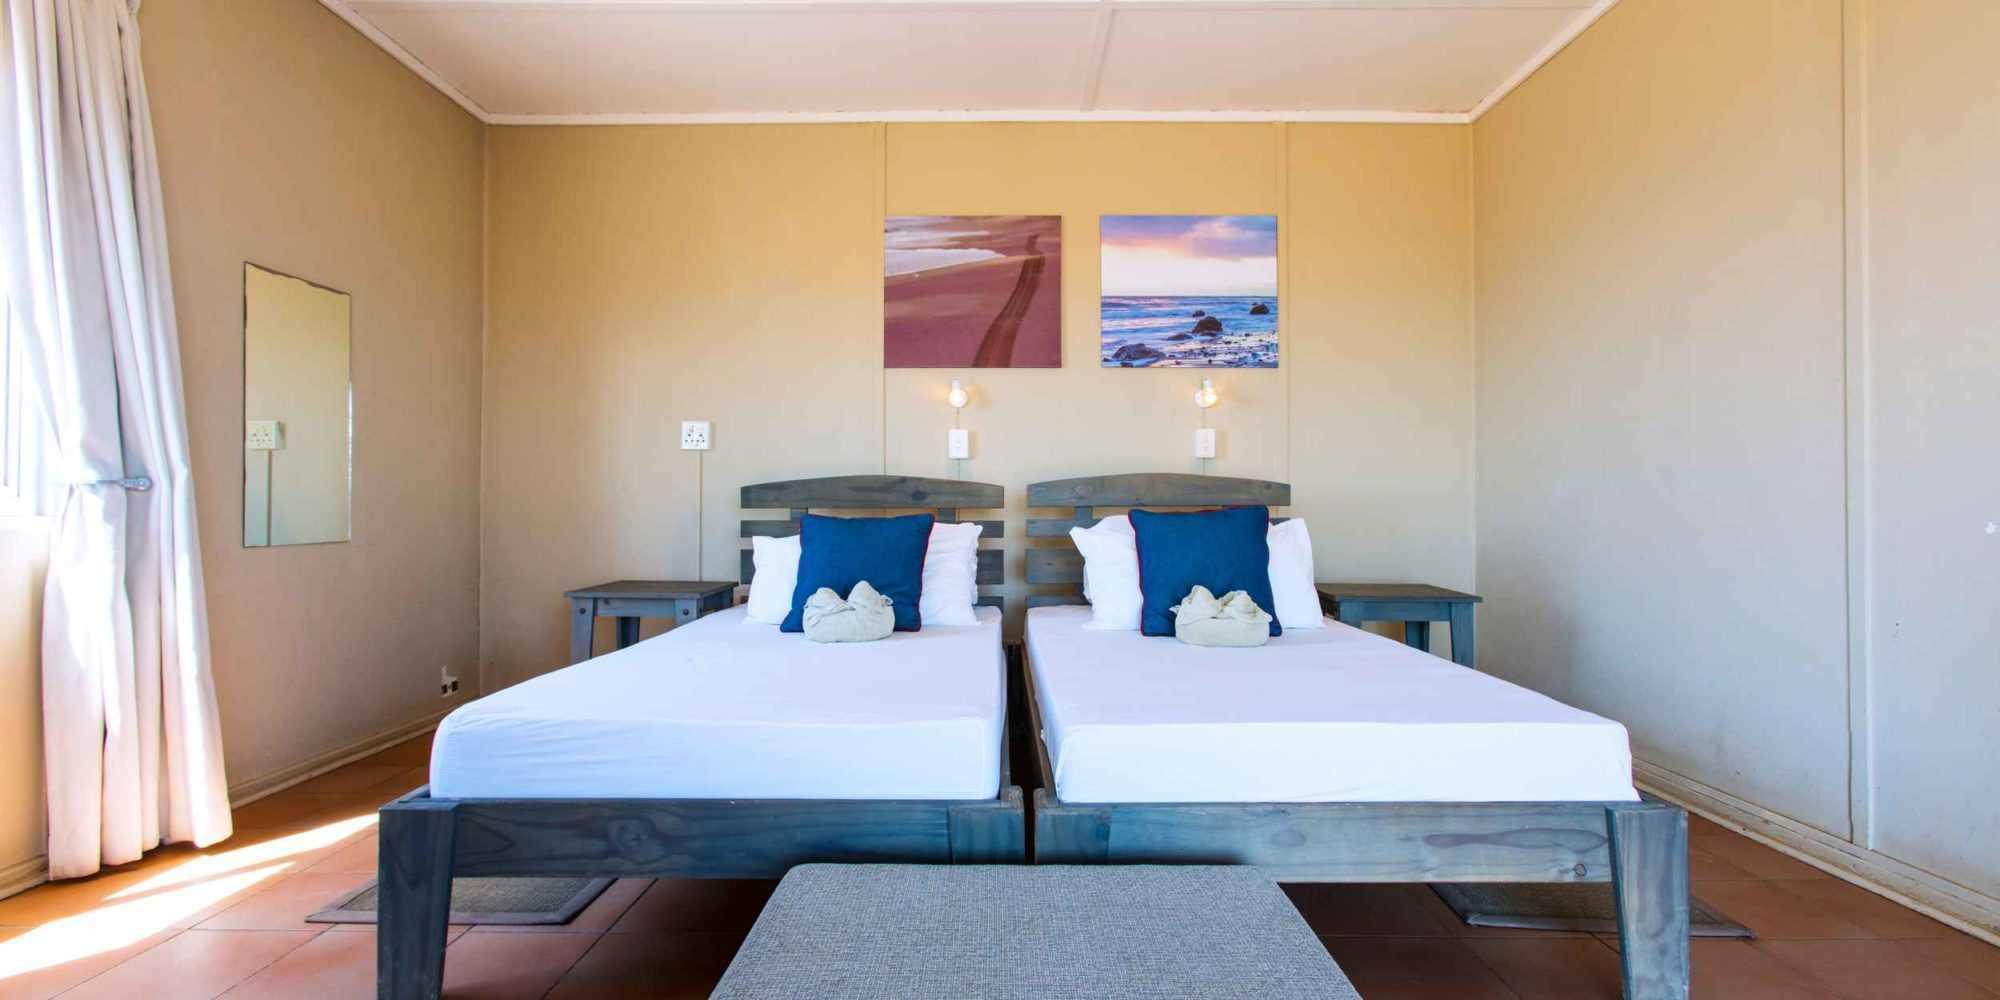 Terrace Bay Double Room 01 © NWR 2018